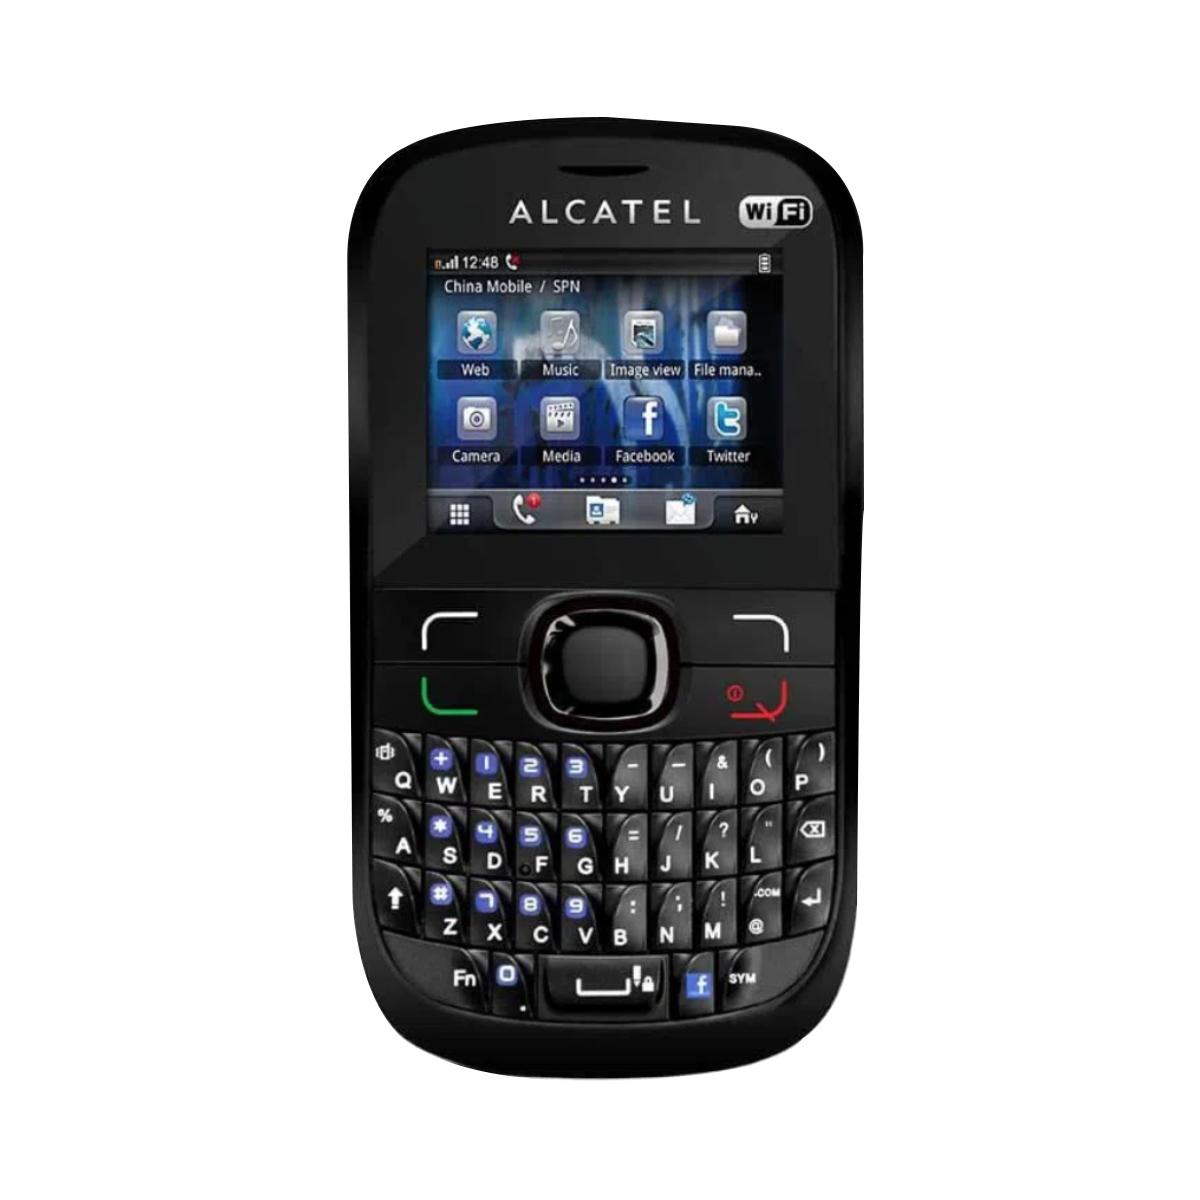 Alcatel Ot639 Dual Chip Qwerty Wi-fi Rádio Mp3 - Mostruário